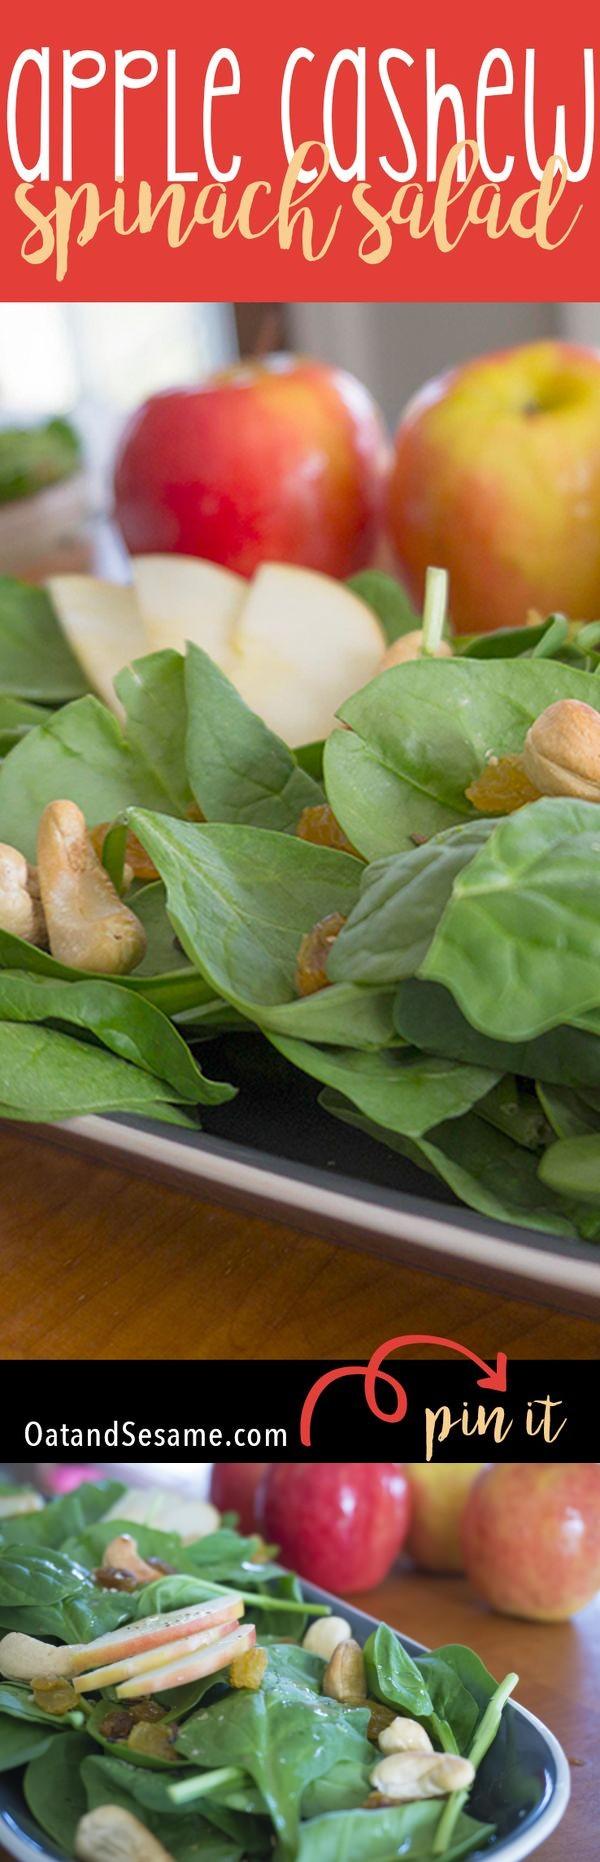 Apple-Cashew Spinach Salad